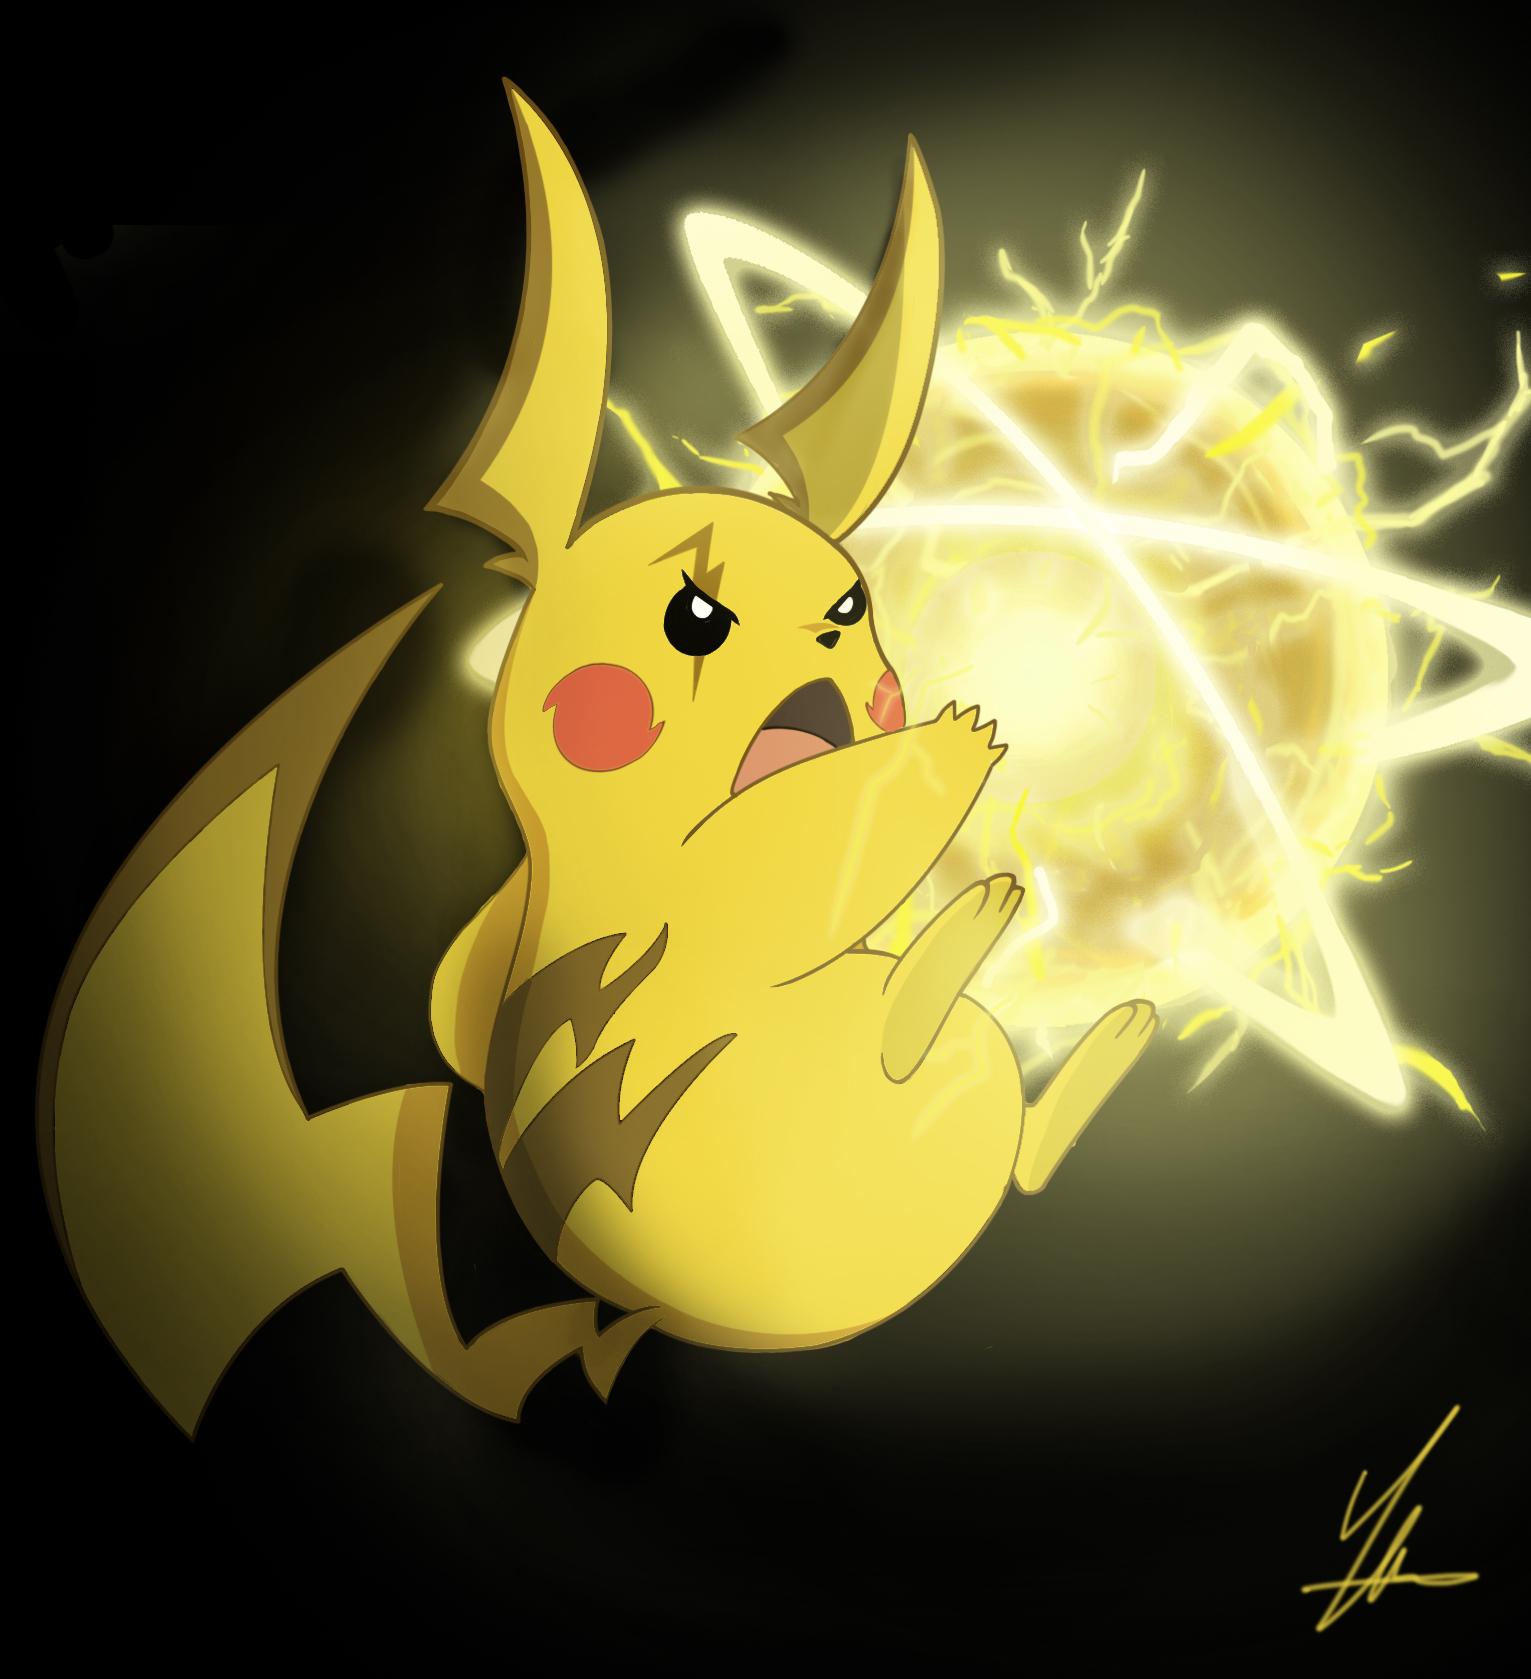 Ash's Mega Pikachu by Yihuilicias on DeviantArt